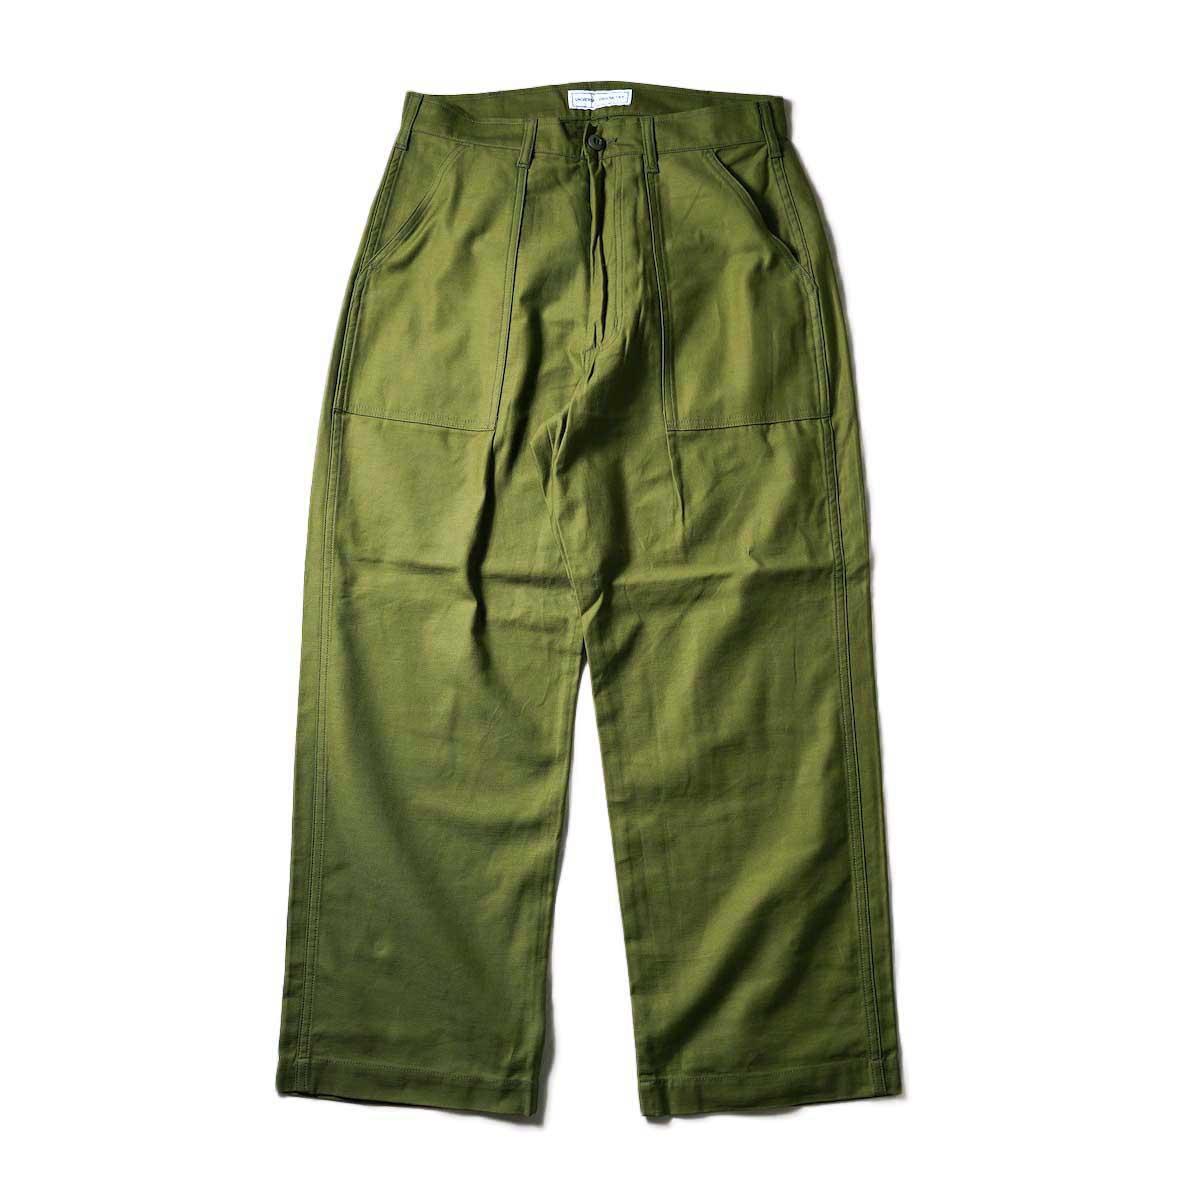 UNIVERSAL PRODUCTS / Gung Ho 1tuck Baker Pants (Olive)